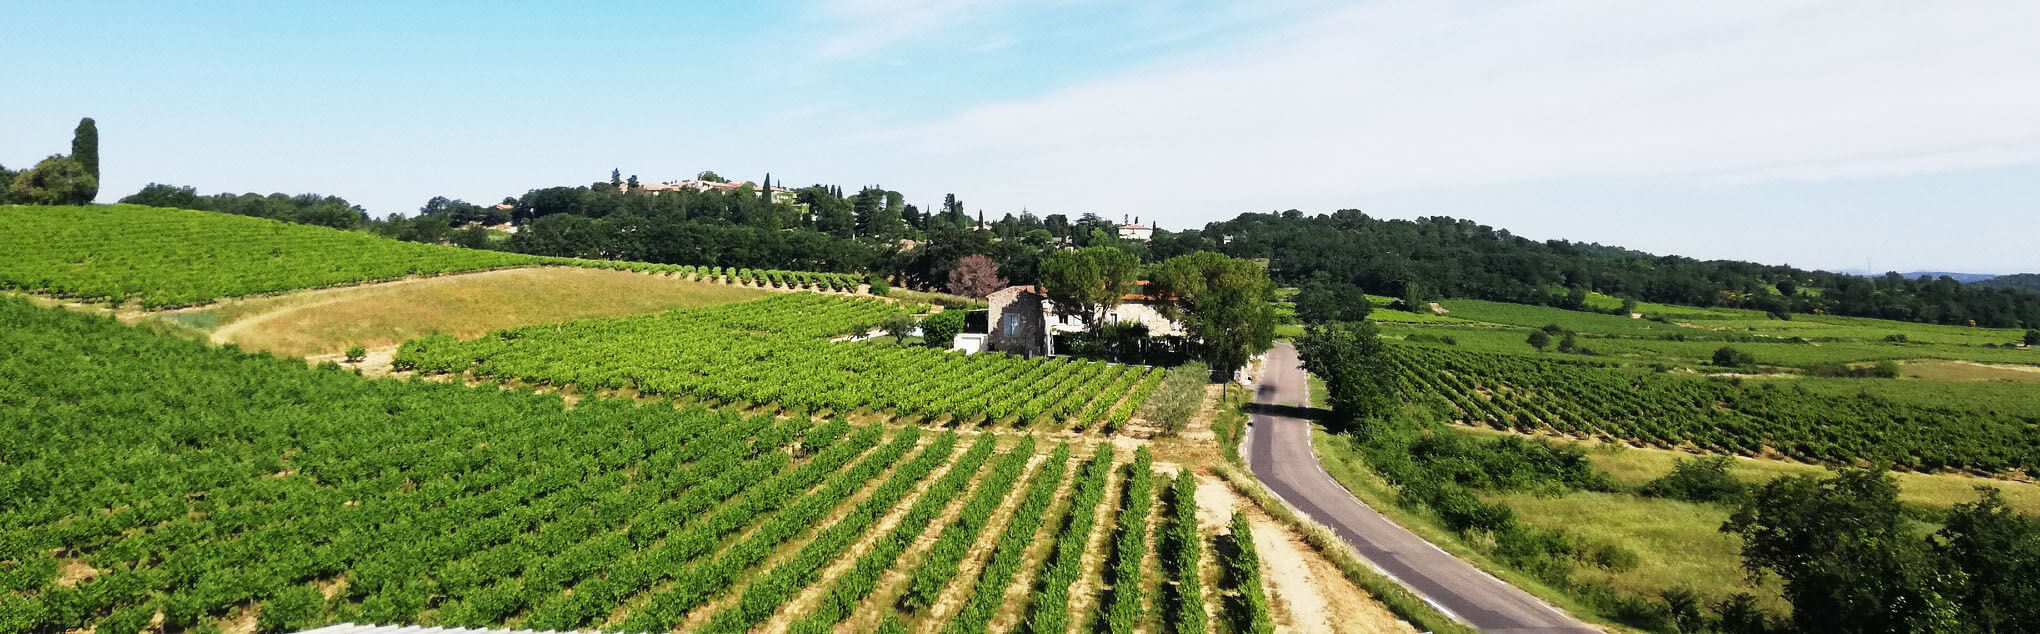 Vignes Cruviers sans voiture